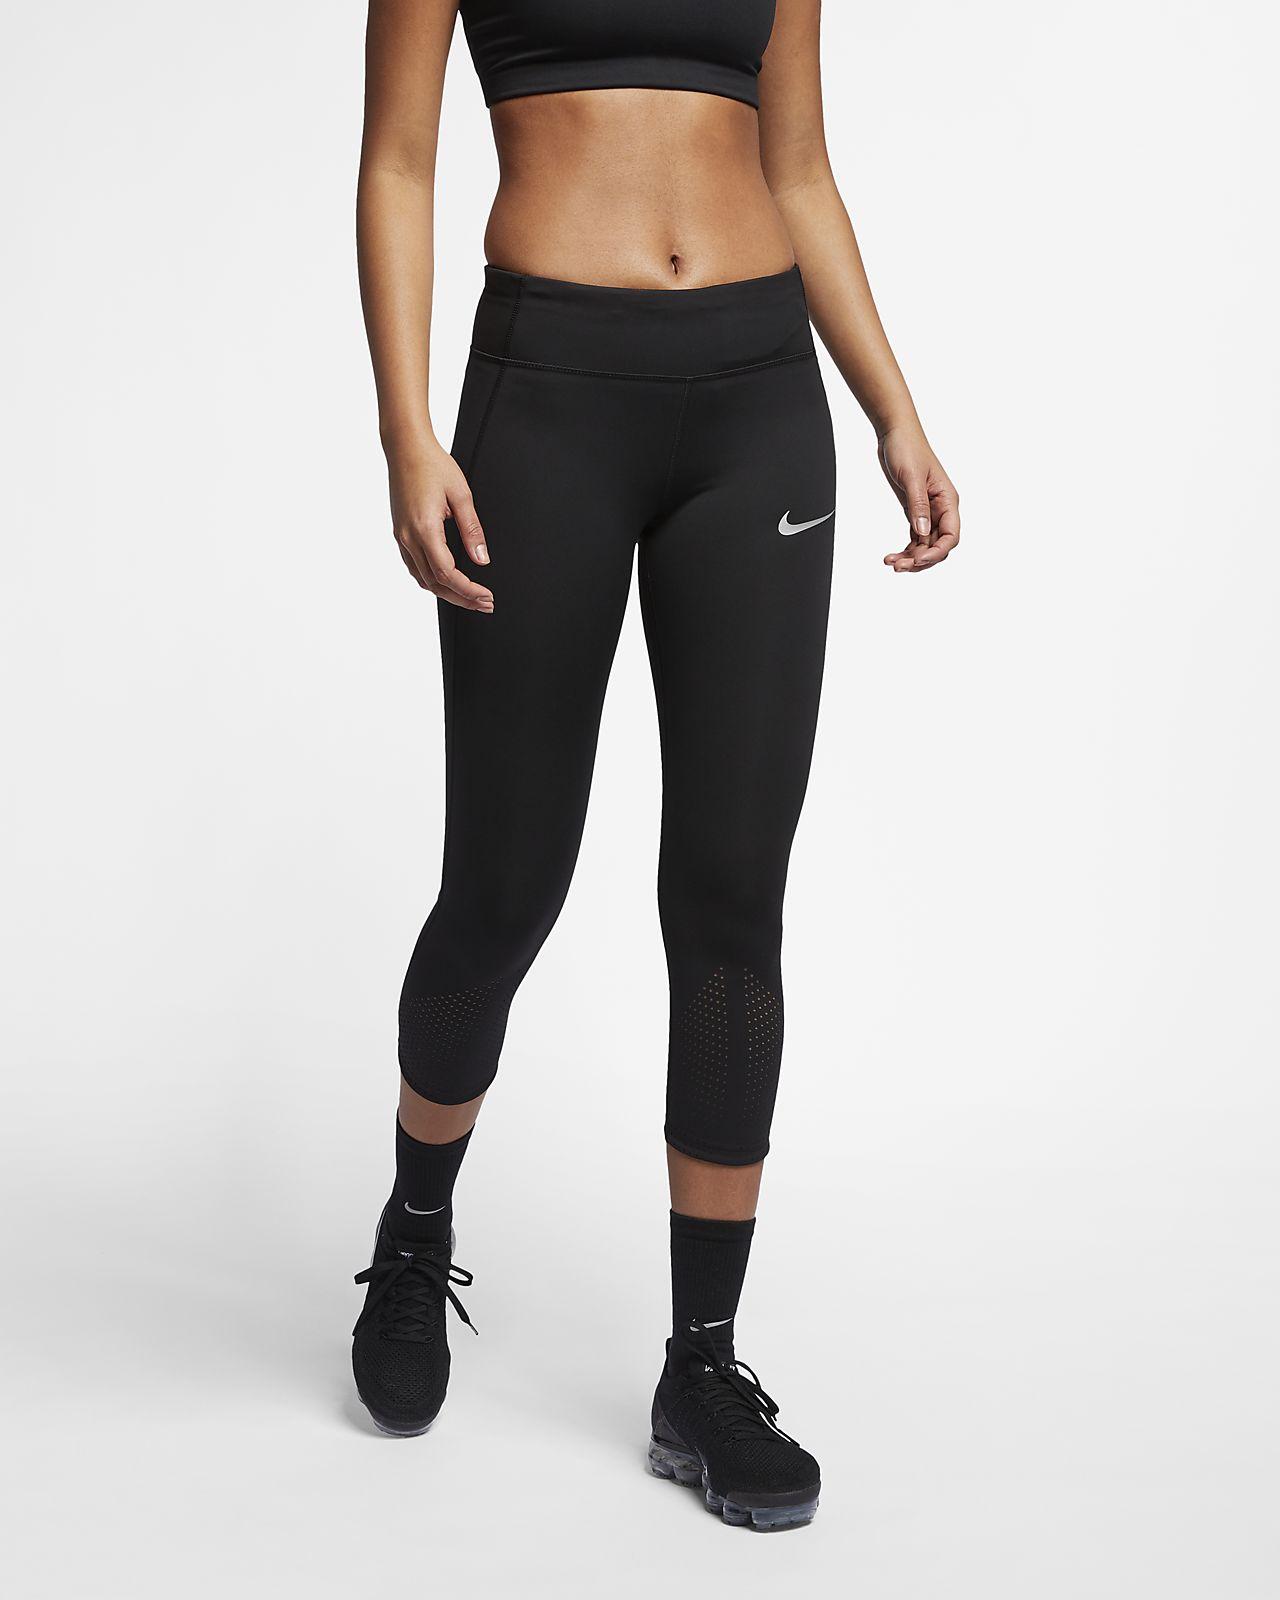 4bd4c320a984 Nike Epic Lux 3/4-es női futónadrág. Nike.com HU